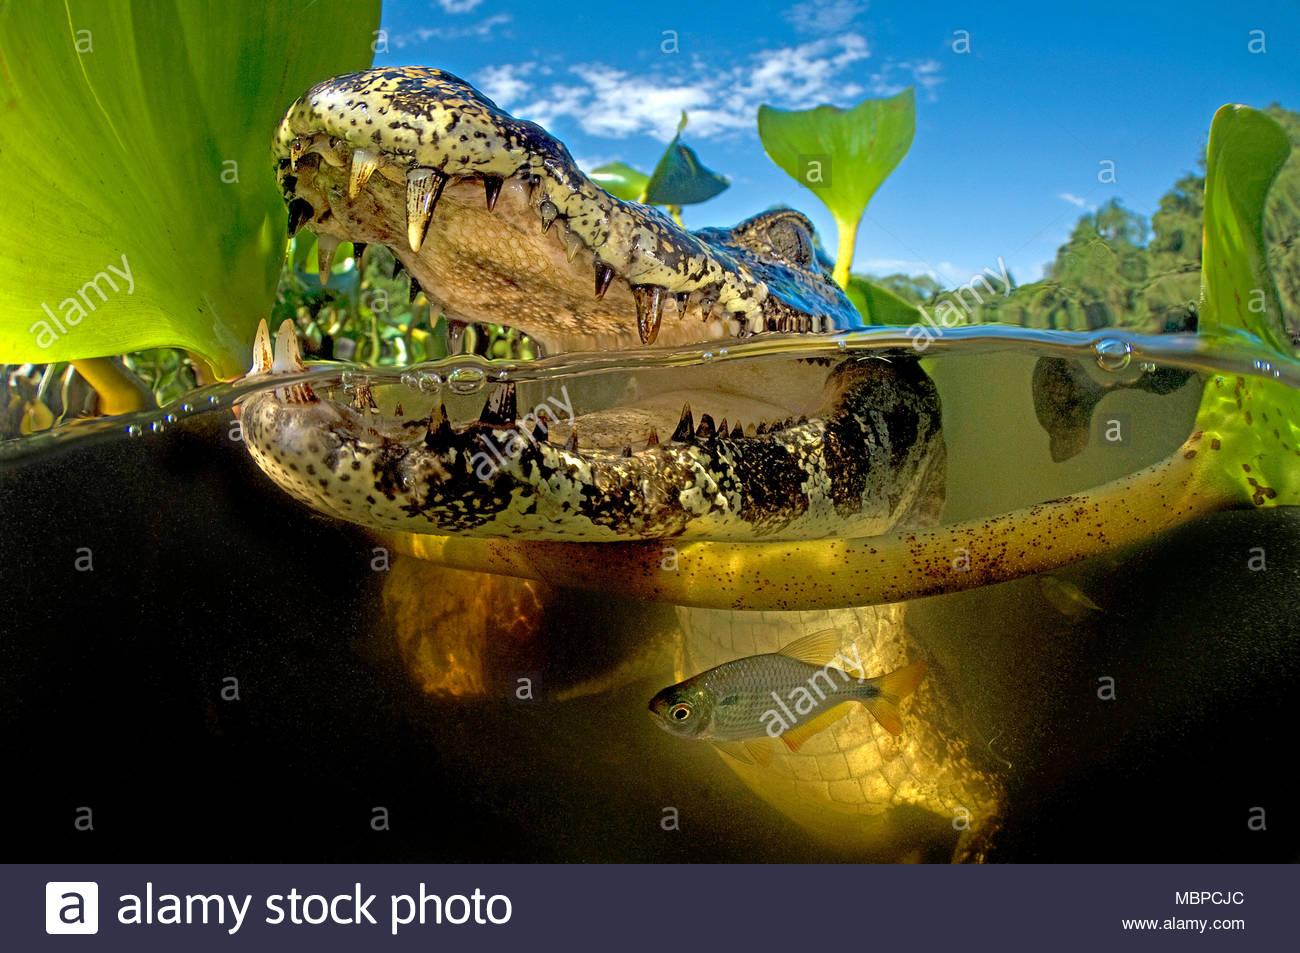 Yacare Caiman (Caiman yacare), split image, Mato Grosso do Sul, Pantanal, Brazil Stock Photo